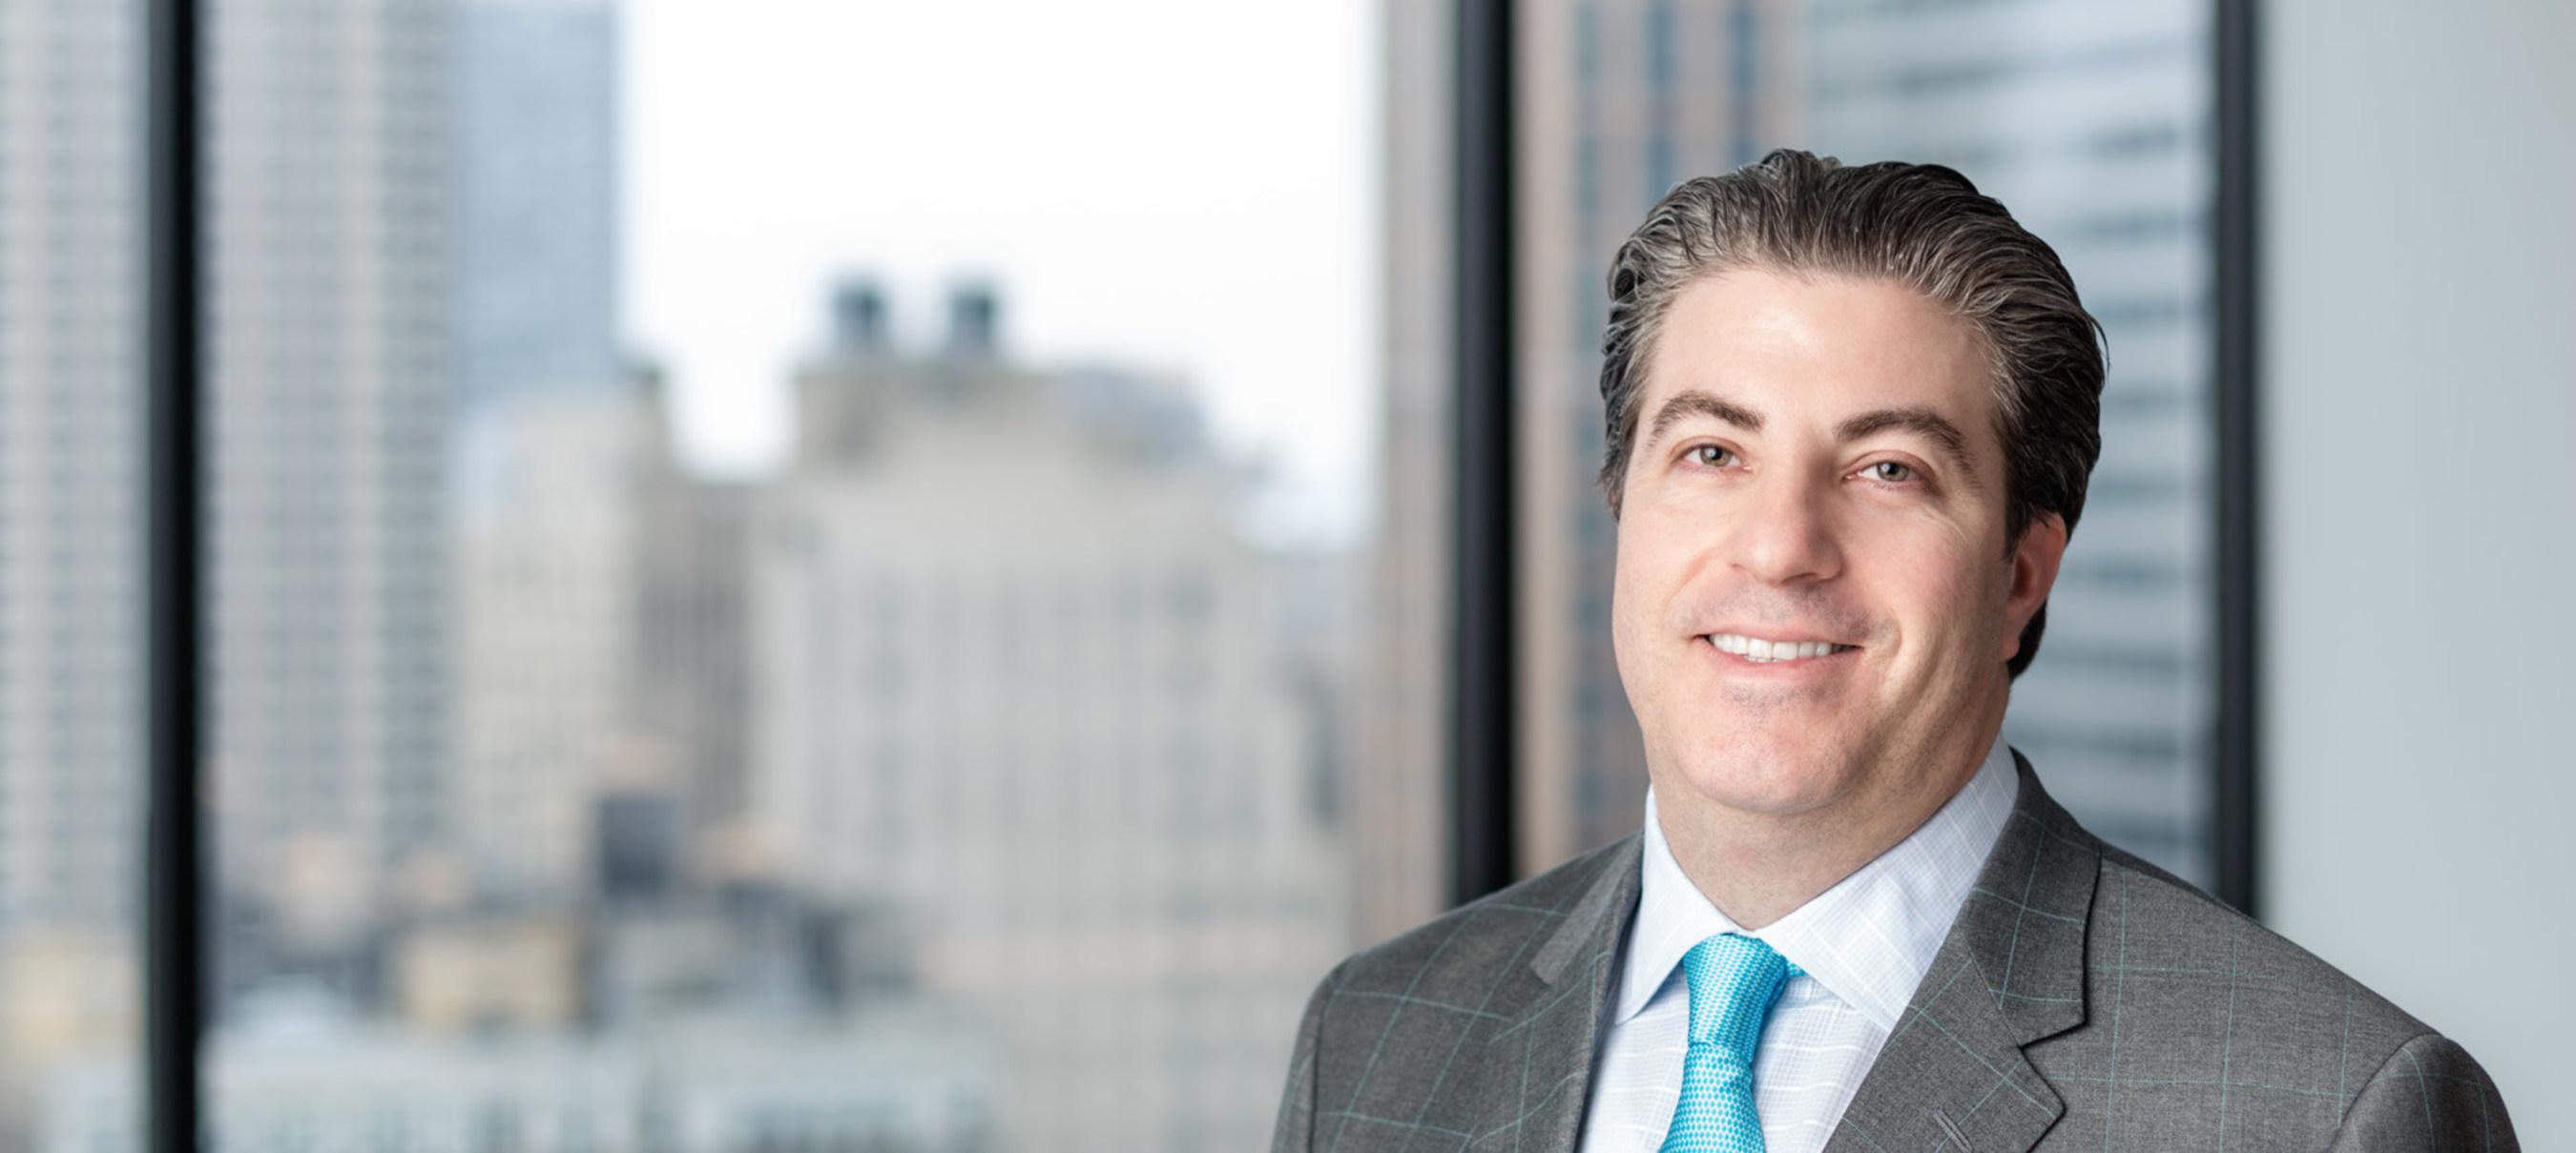 Daniel Kaplan - Global Co-Head of the Human Resources Officers Practice - Heidrick & Struggles